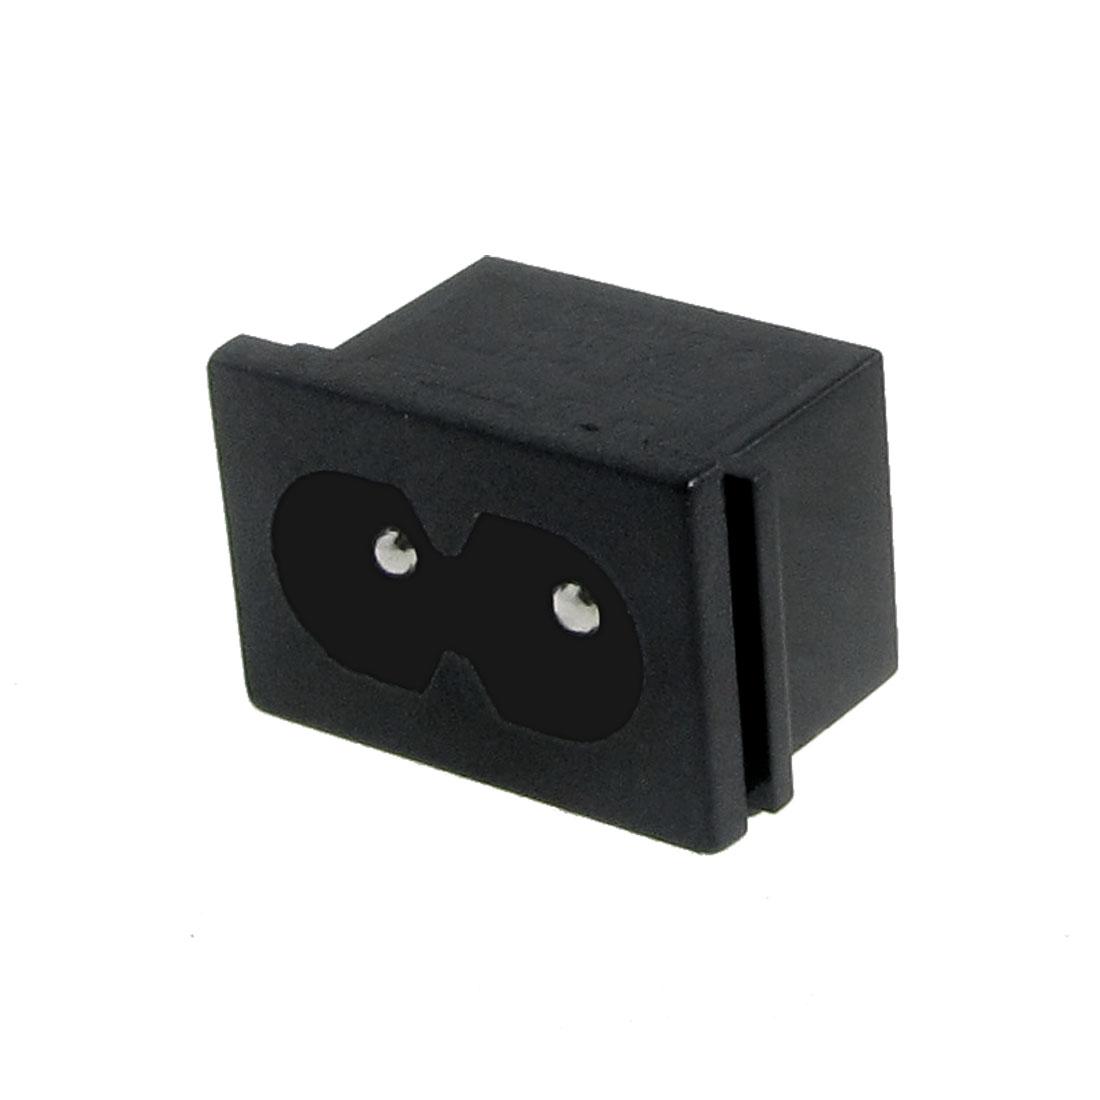 2.5A 250V Male Plug IEC 320 C8 AC Power Socket Connector 10 Pcs